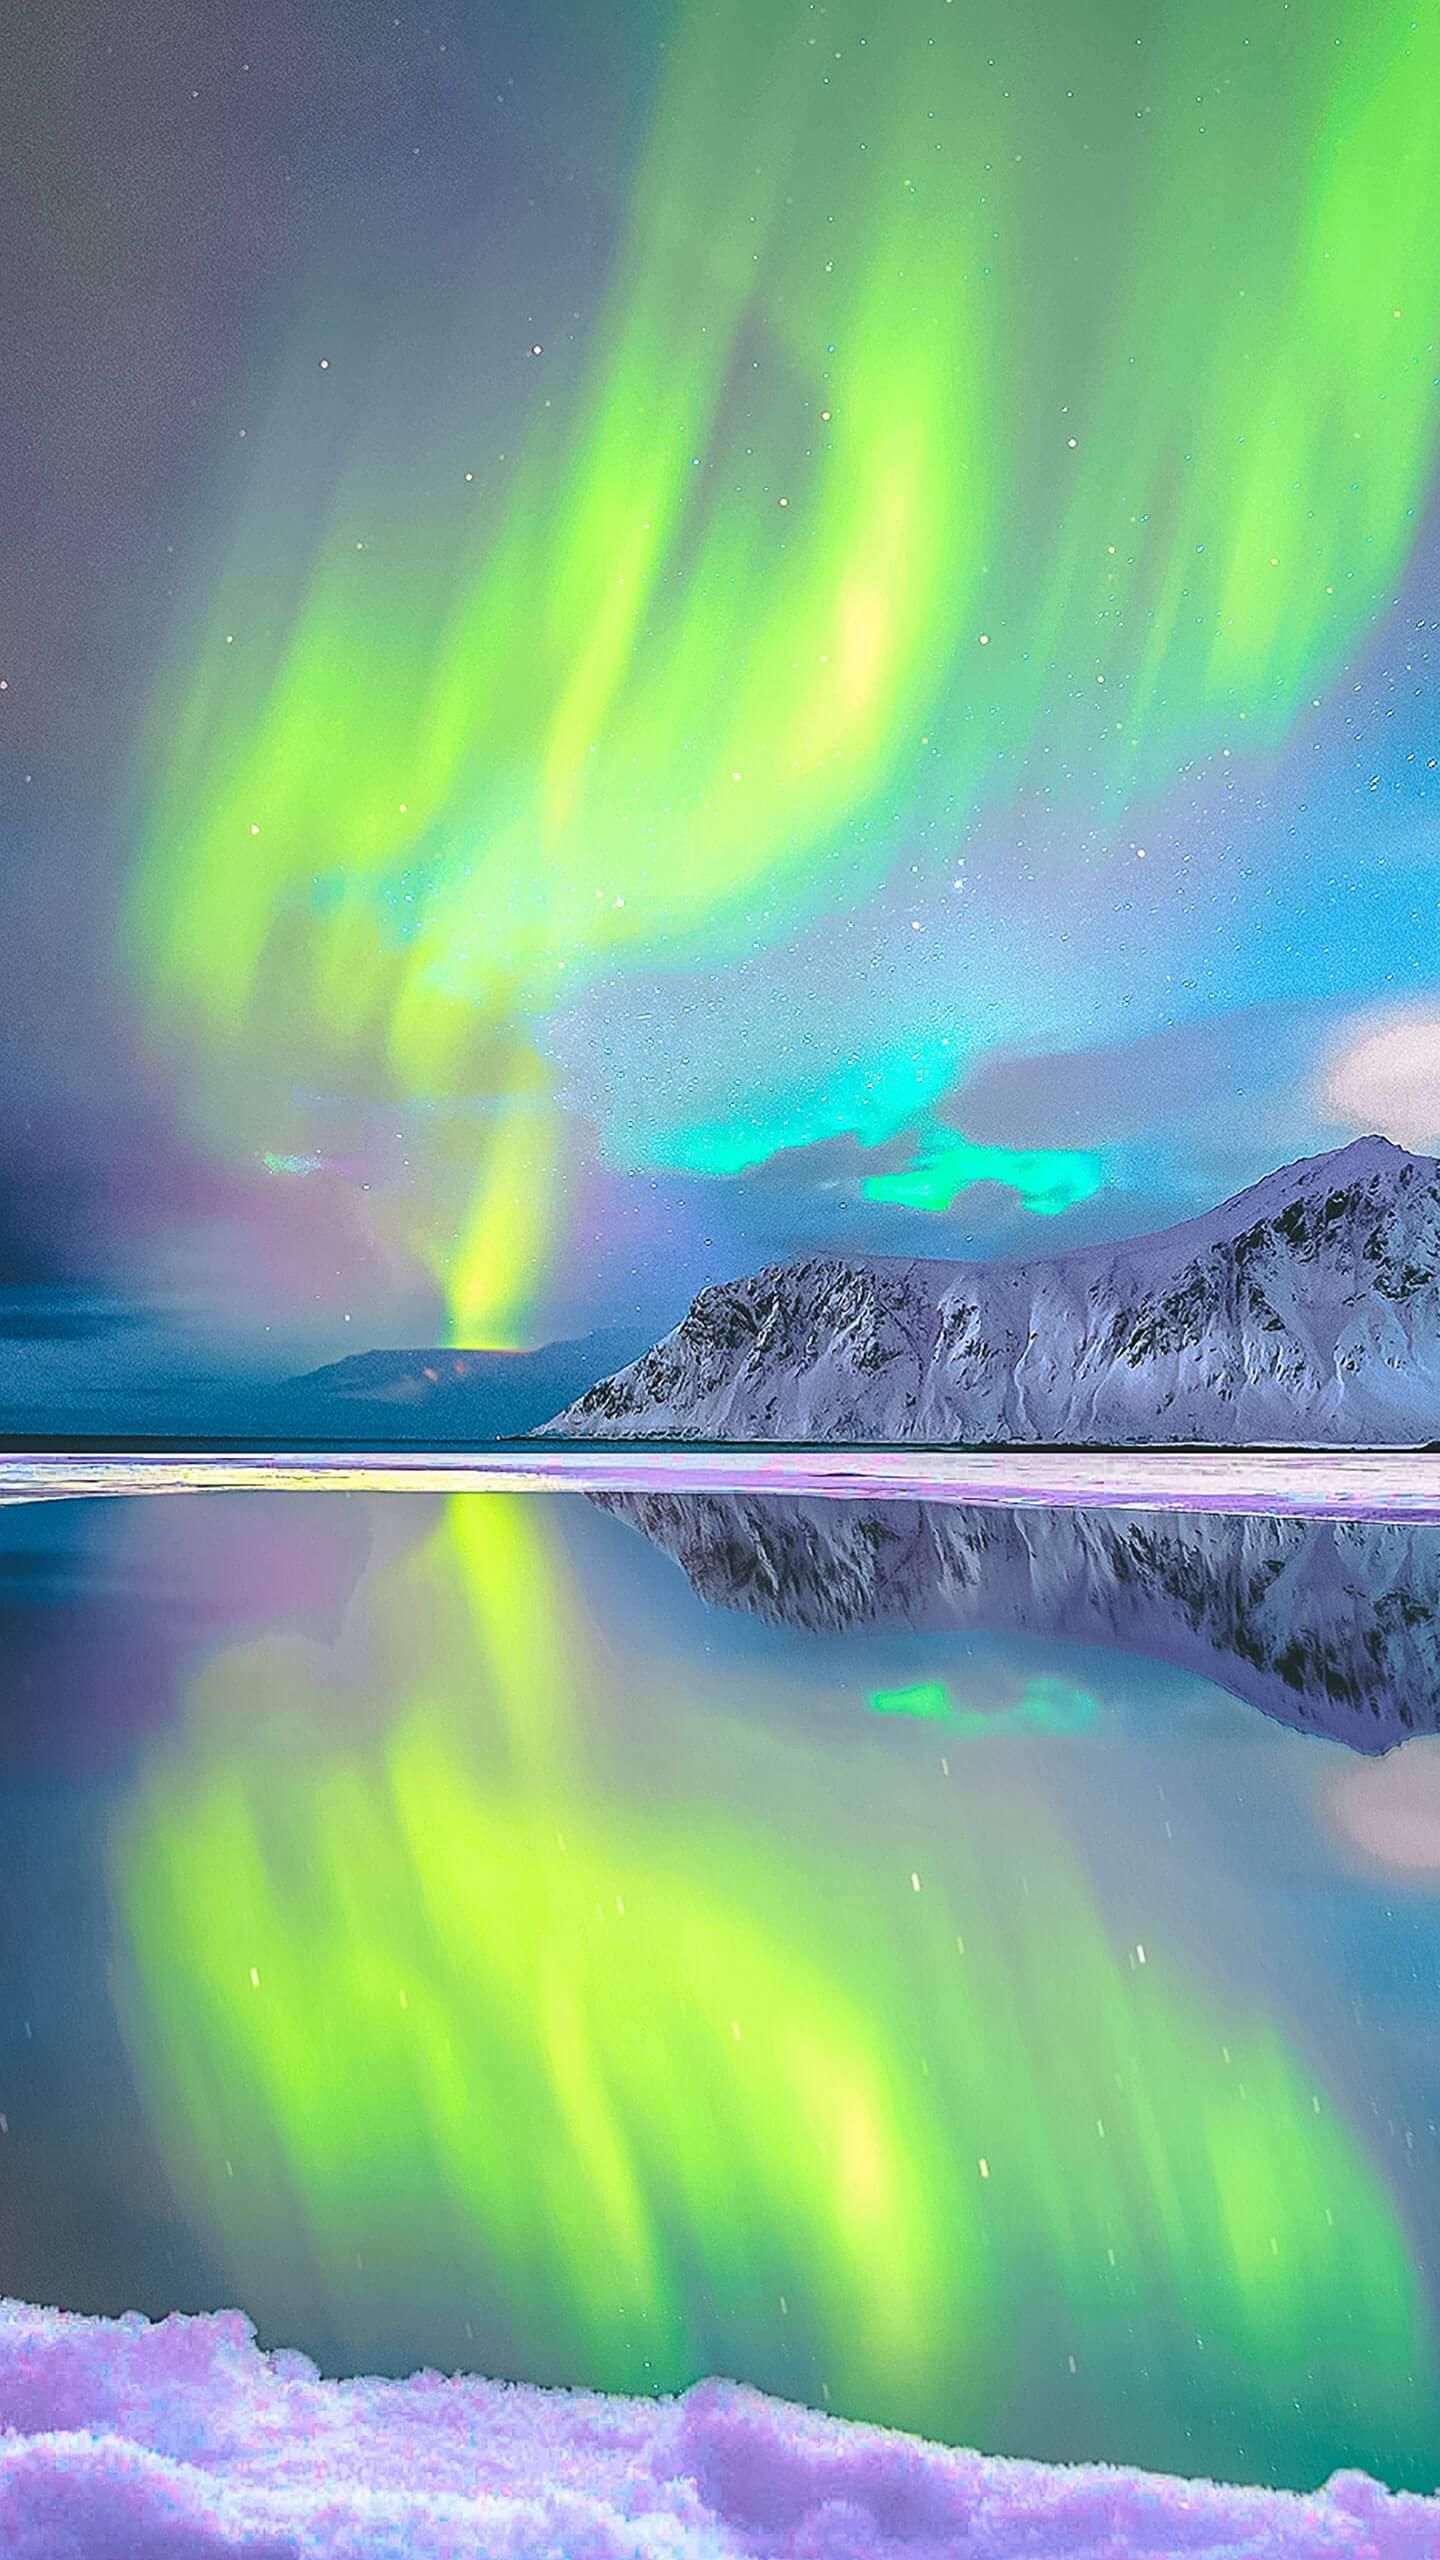 Aurora Borealis Norway iPhone Wallpaper - iPhone Wallpapers